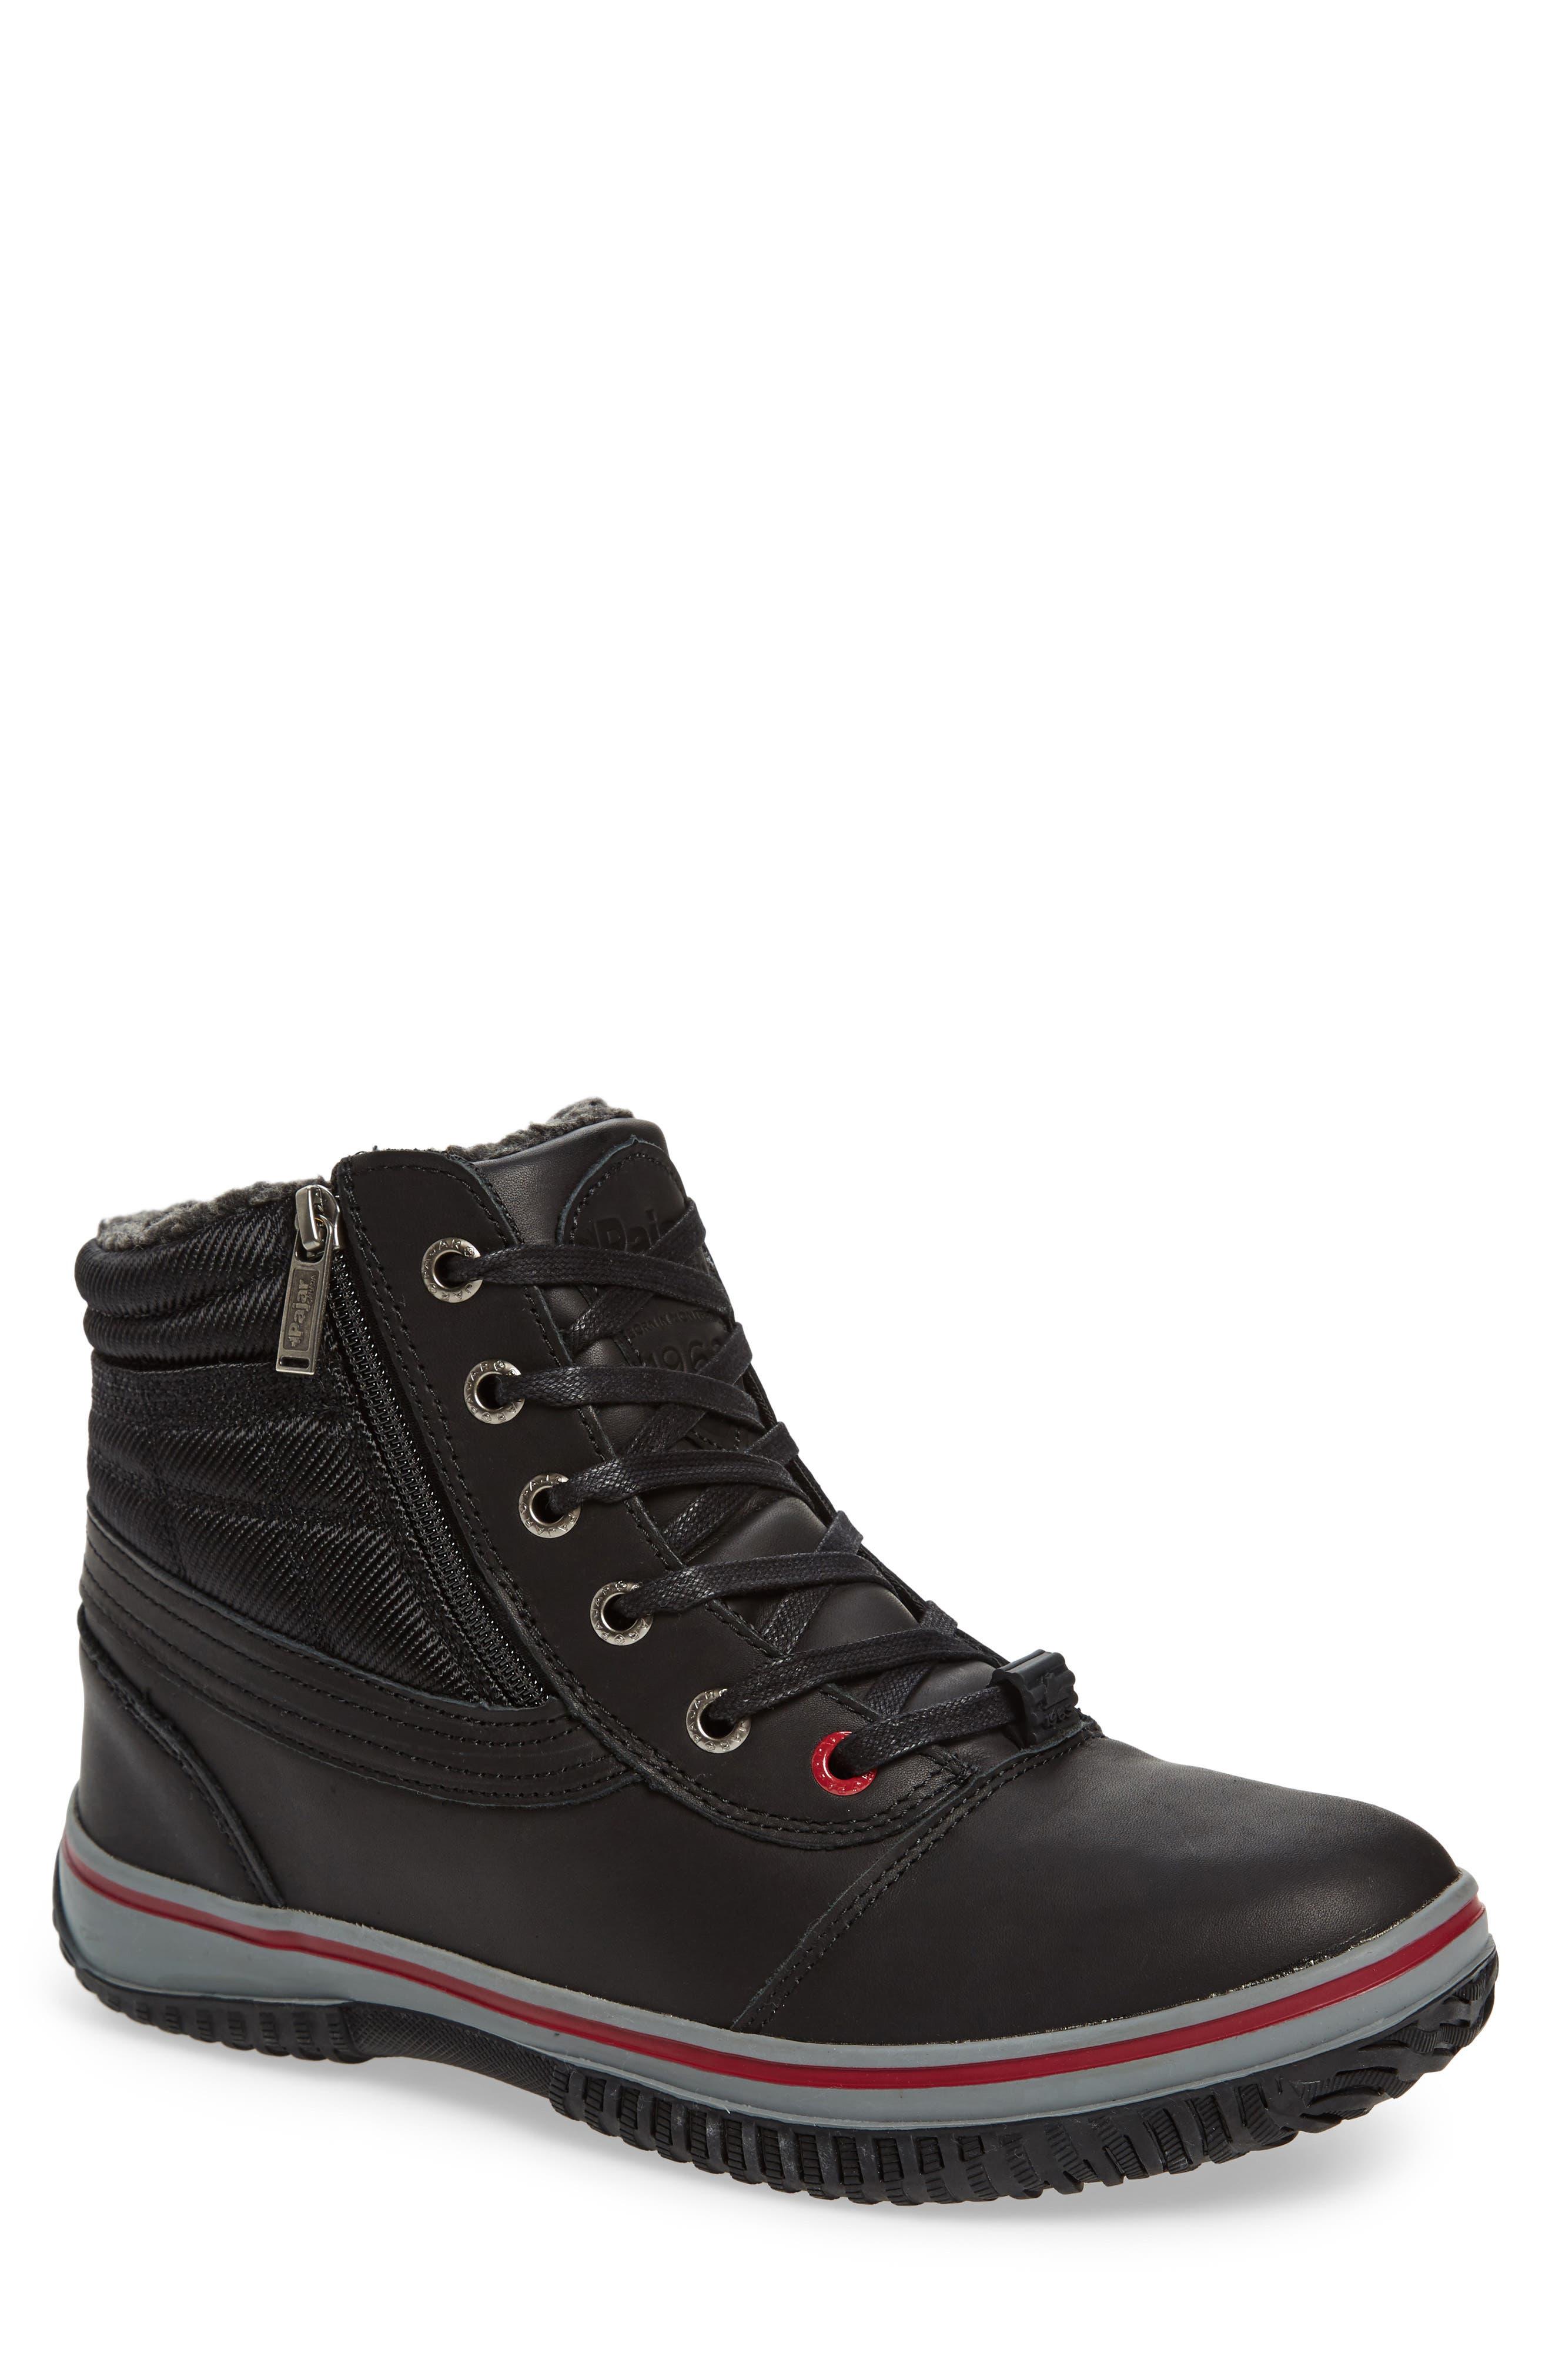 Tavin Waterproof Winter Boot,                         Main,                         color, 001